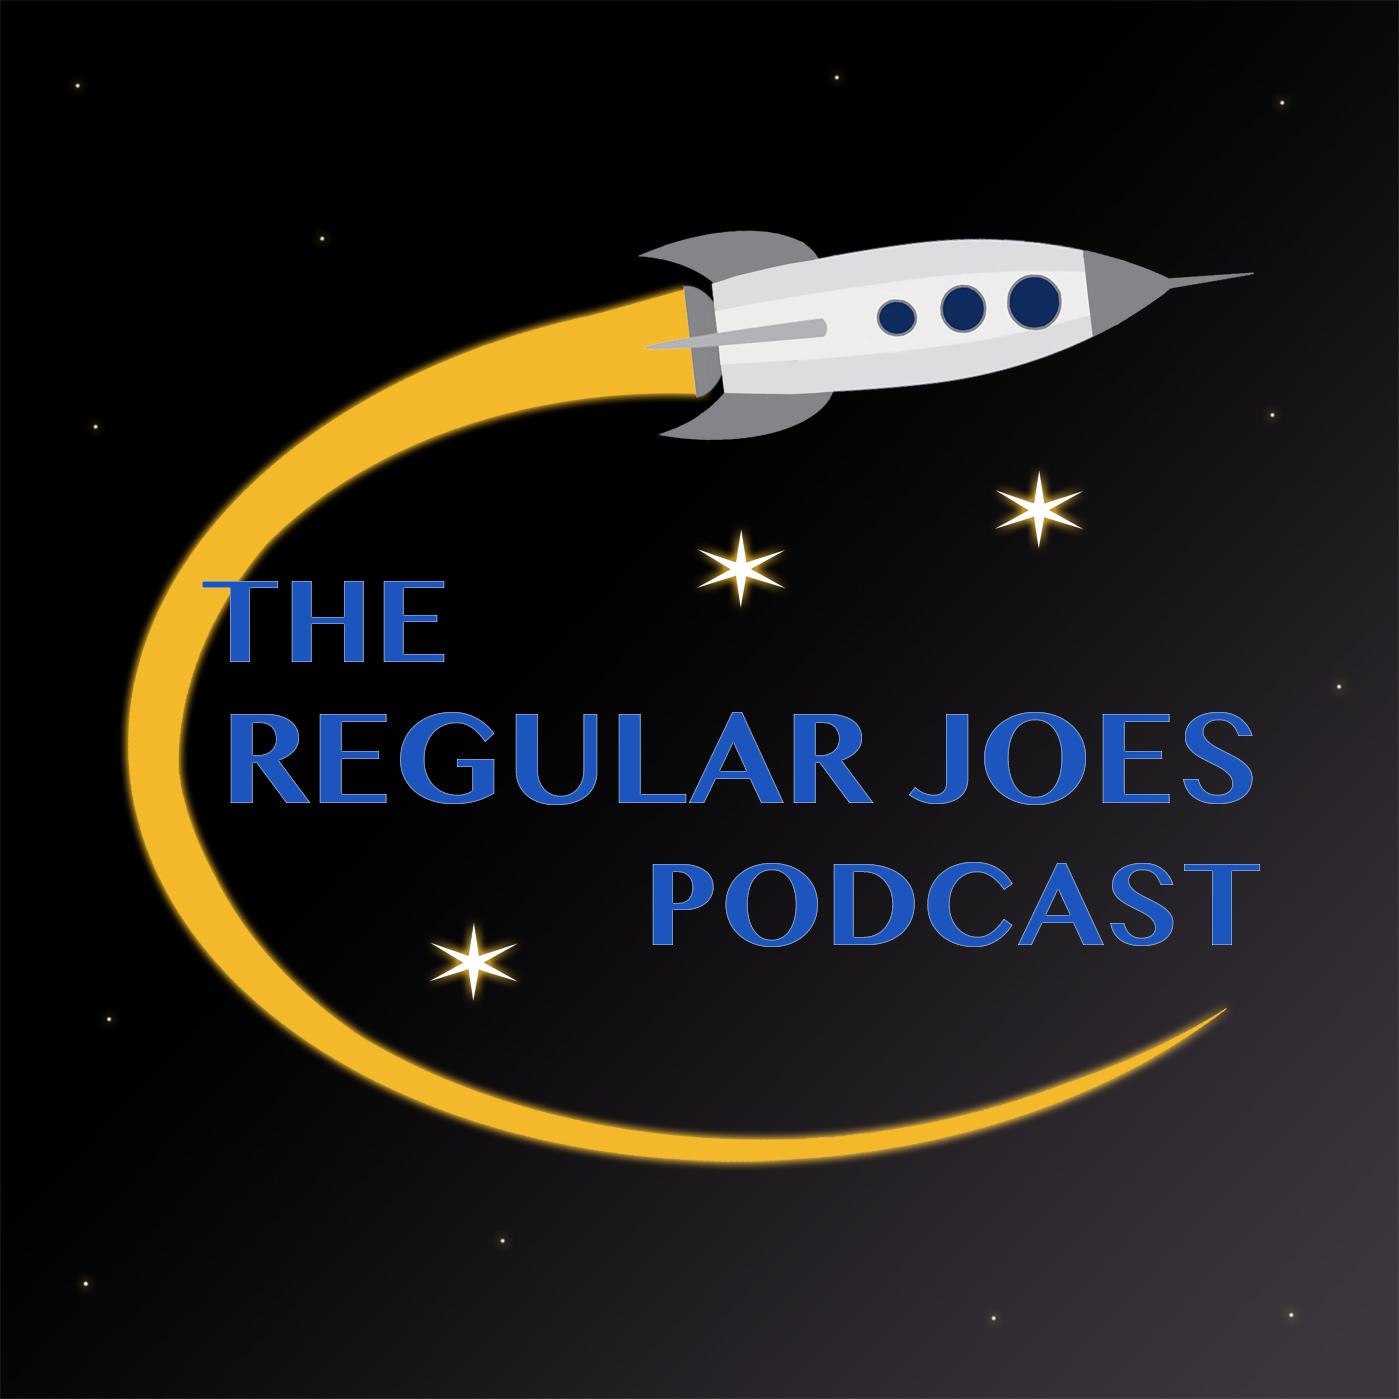 Regular Joes Podcast logo